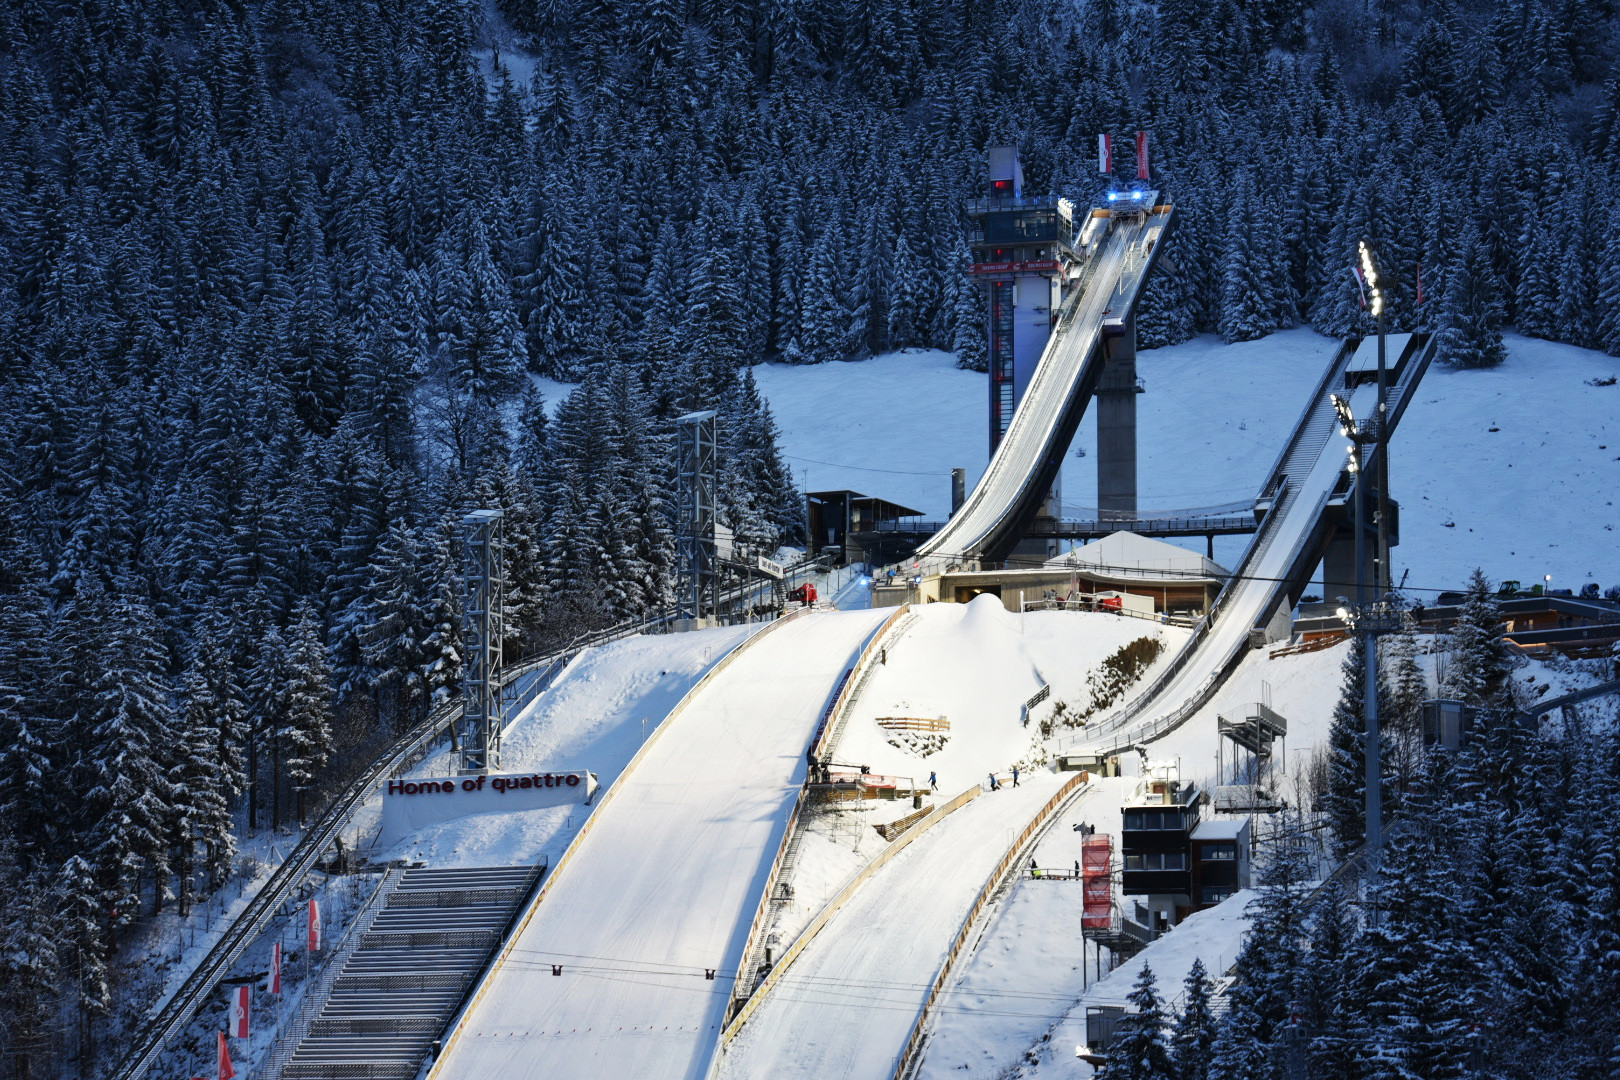 Event-Übersicht: Nordische Ski-WM 2019 in Seefeld / Innsbruck - skispringen.com - skispringen.com